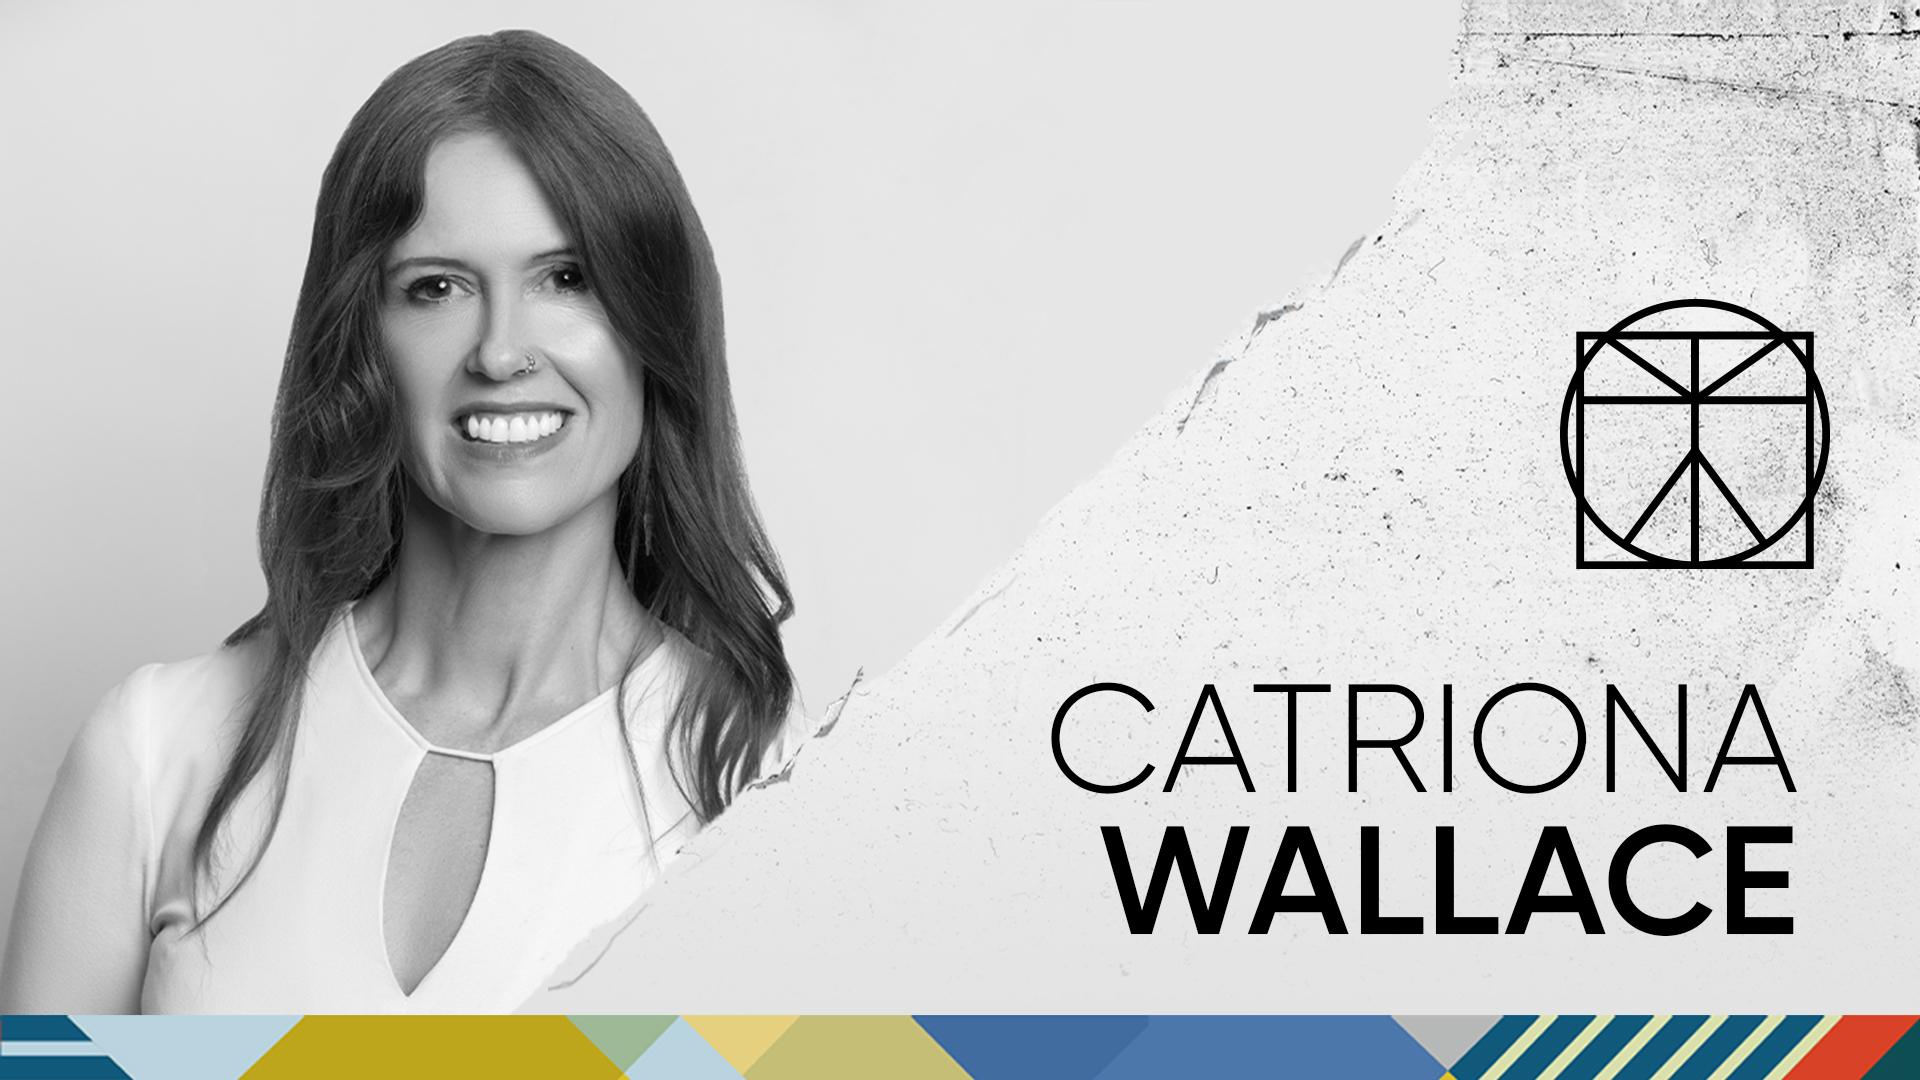 Dr Catriona Wallace Futurist 2nd Renaissance Anders Sorman-Nilsson